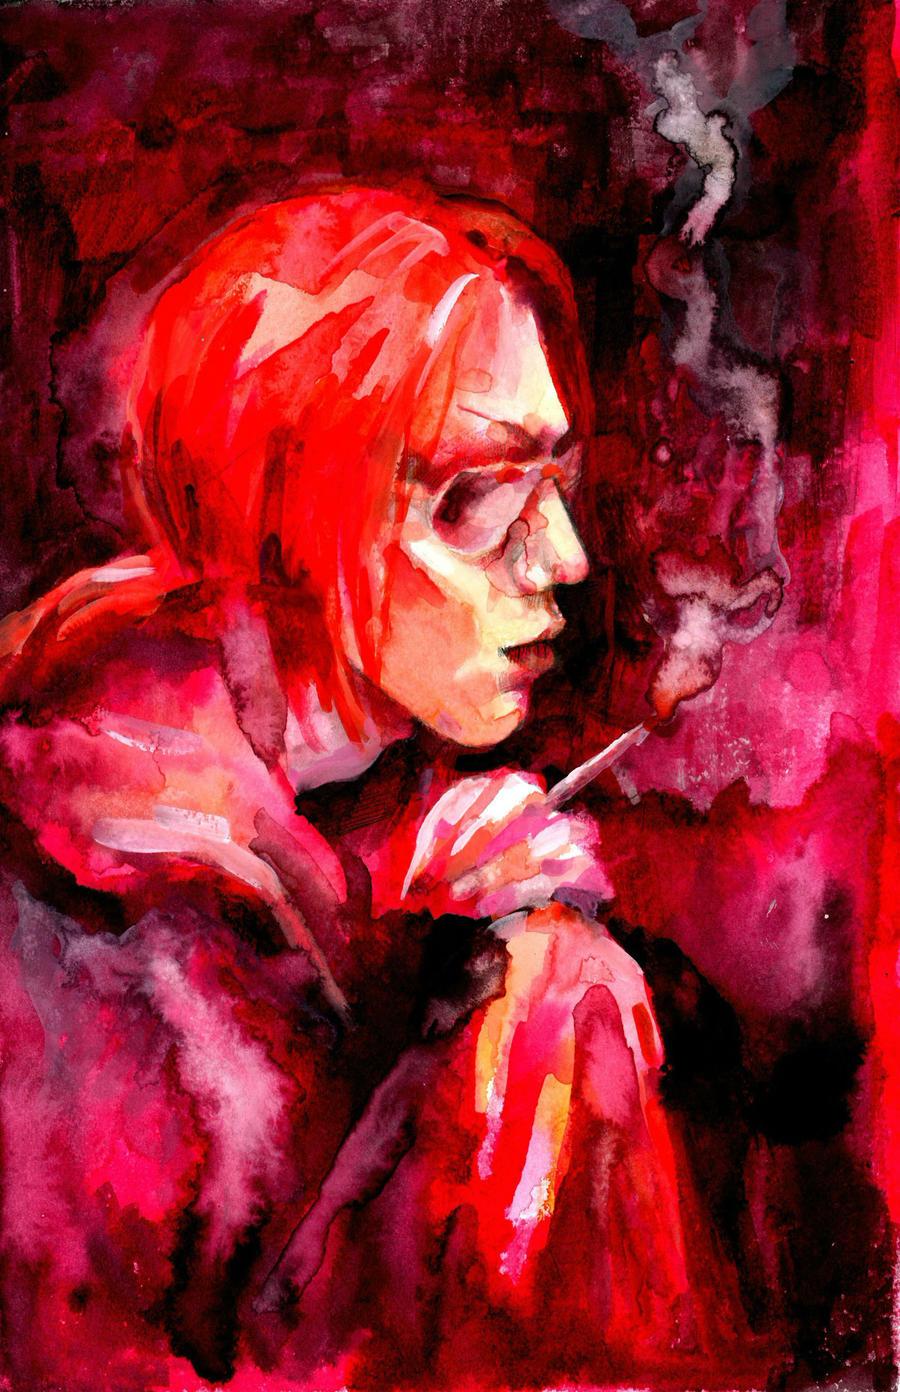 red smoke by ototoi